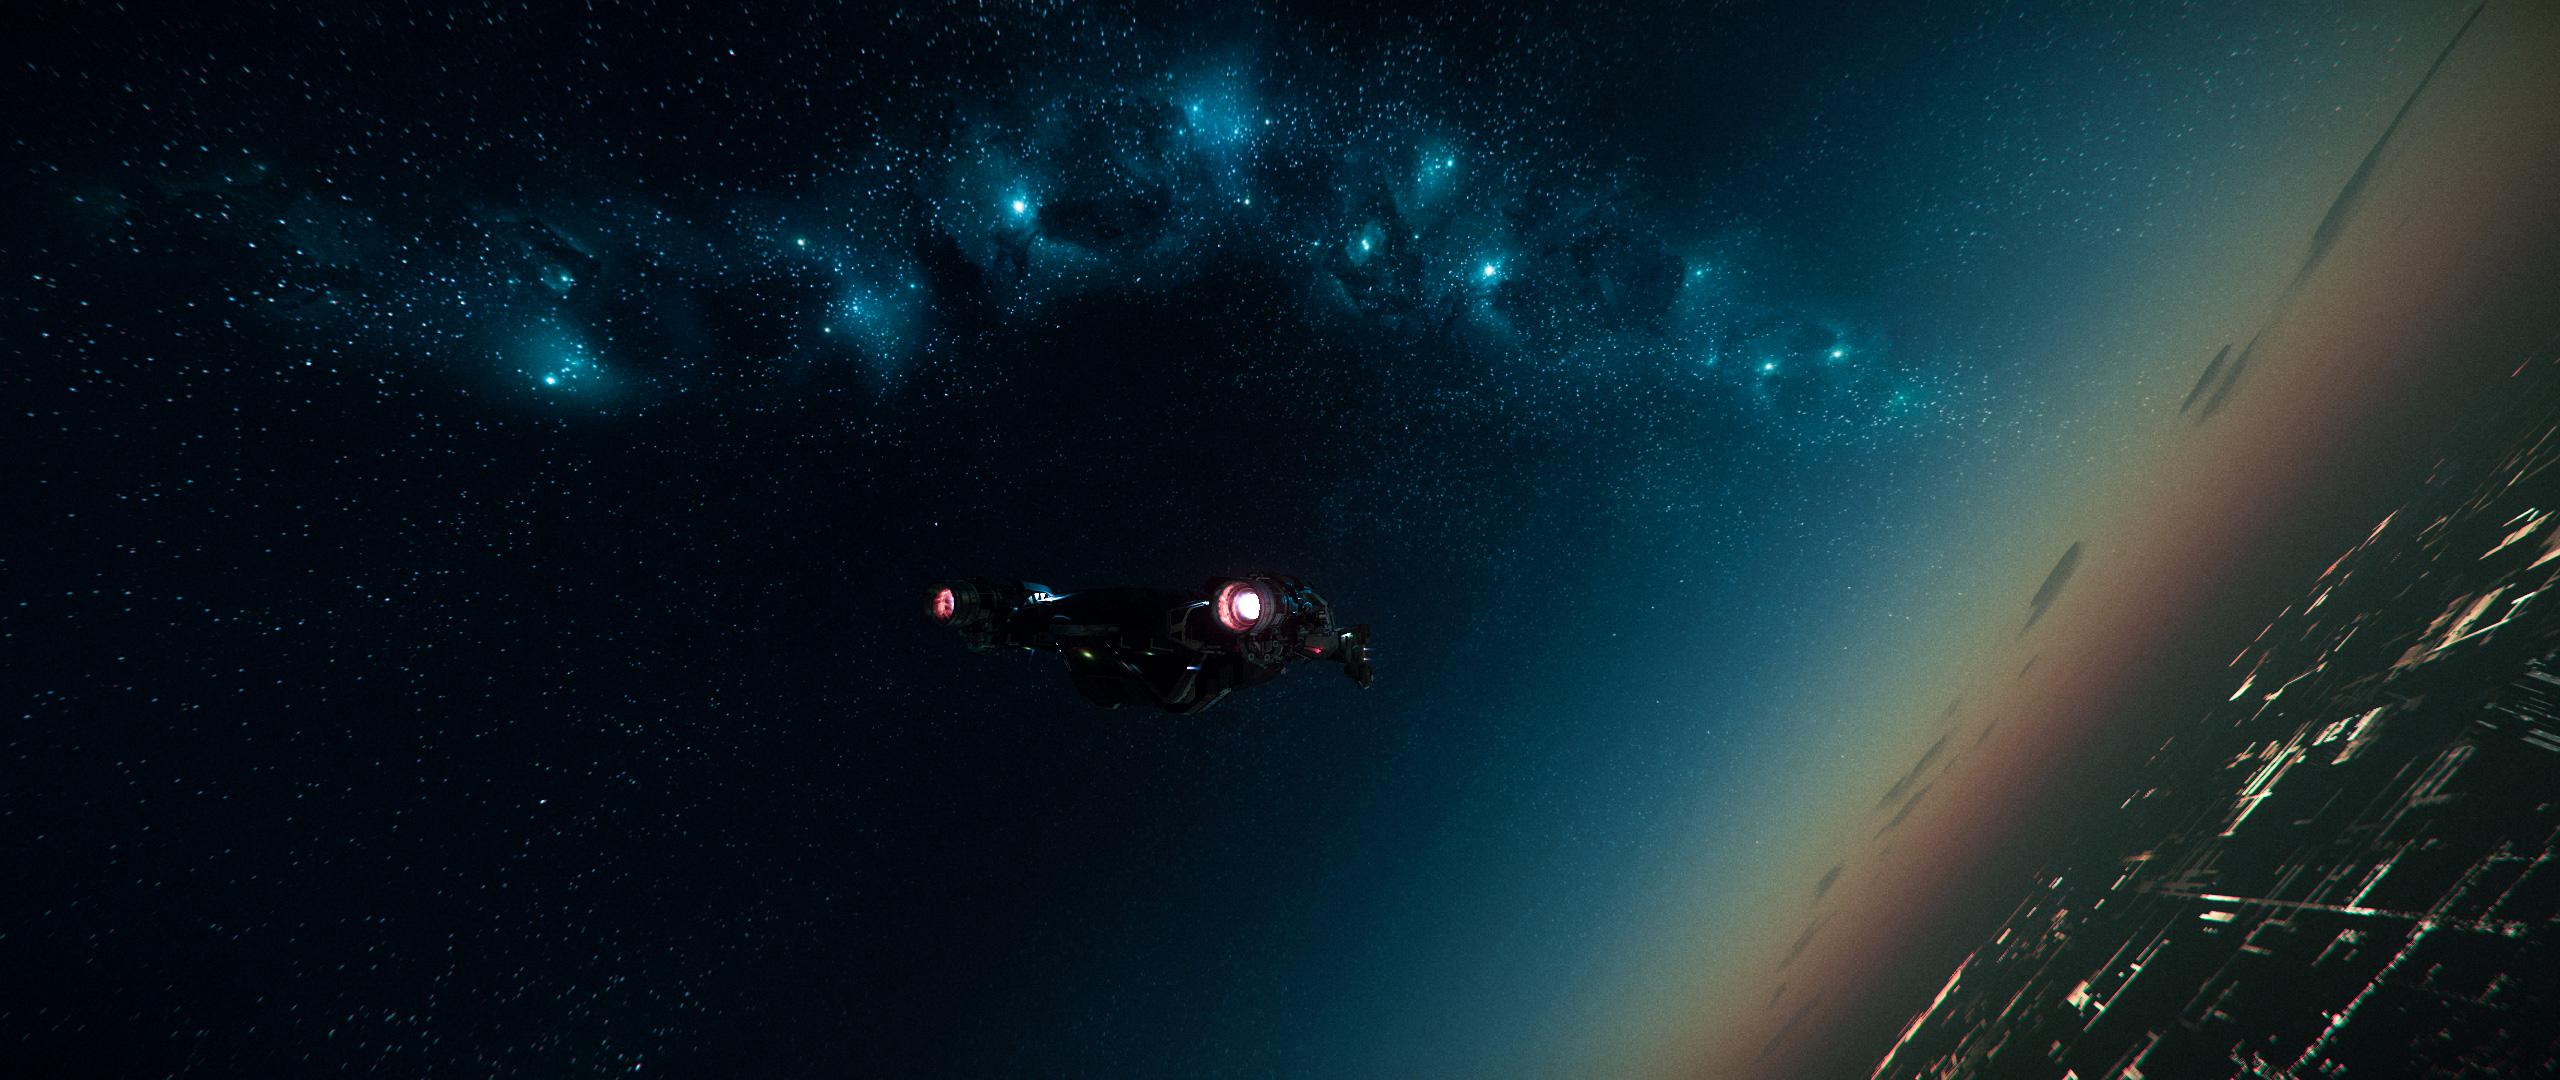 General 2560x1080 Star Citizen ultrawide Ultra Settings screen shot space planet spaceship Cutlass Black